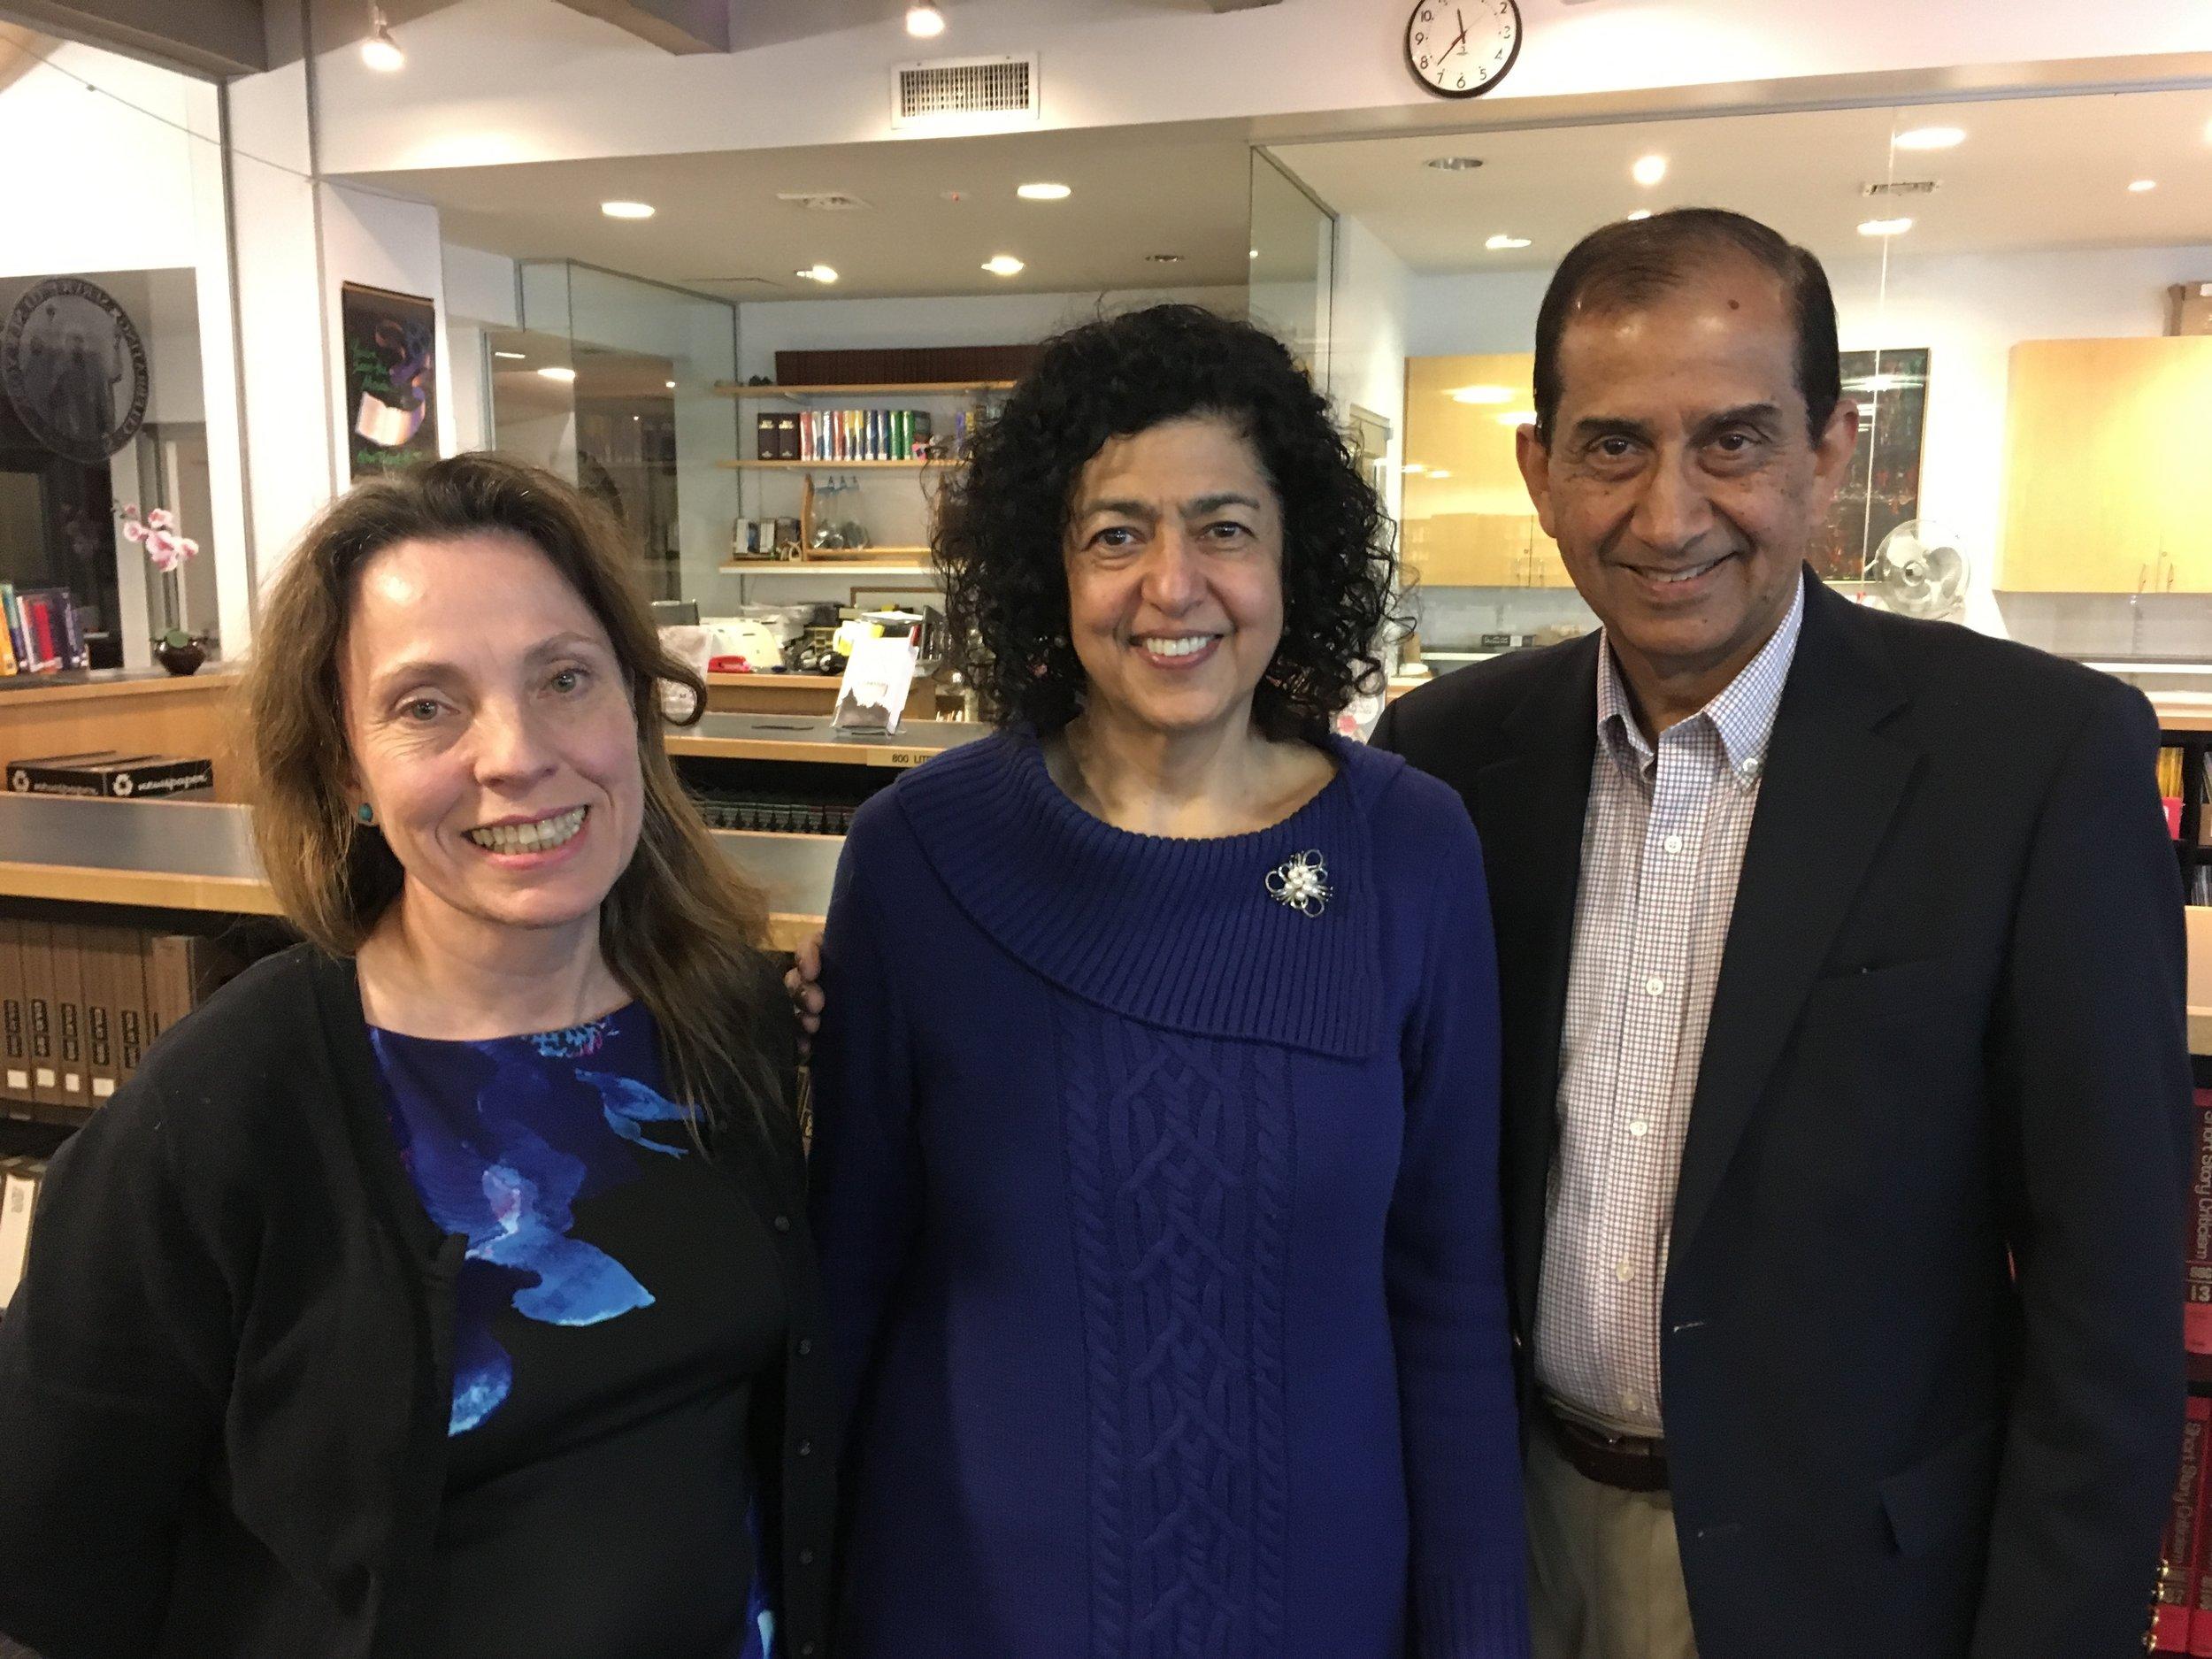 With Luz Marina Diaz and my husband Khalid at St. Francis of Xavier Church library.